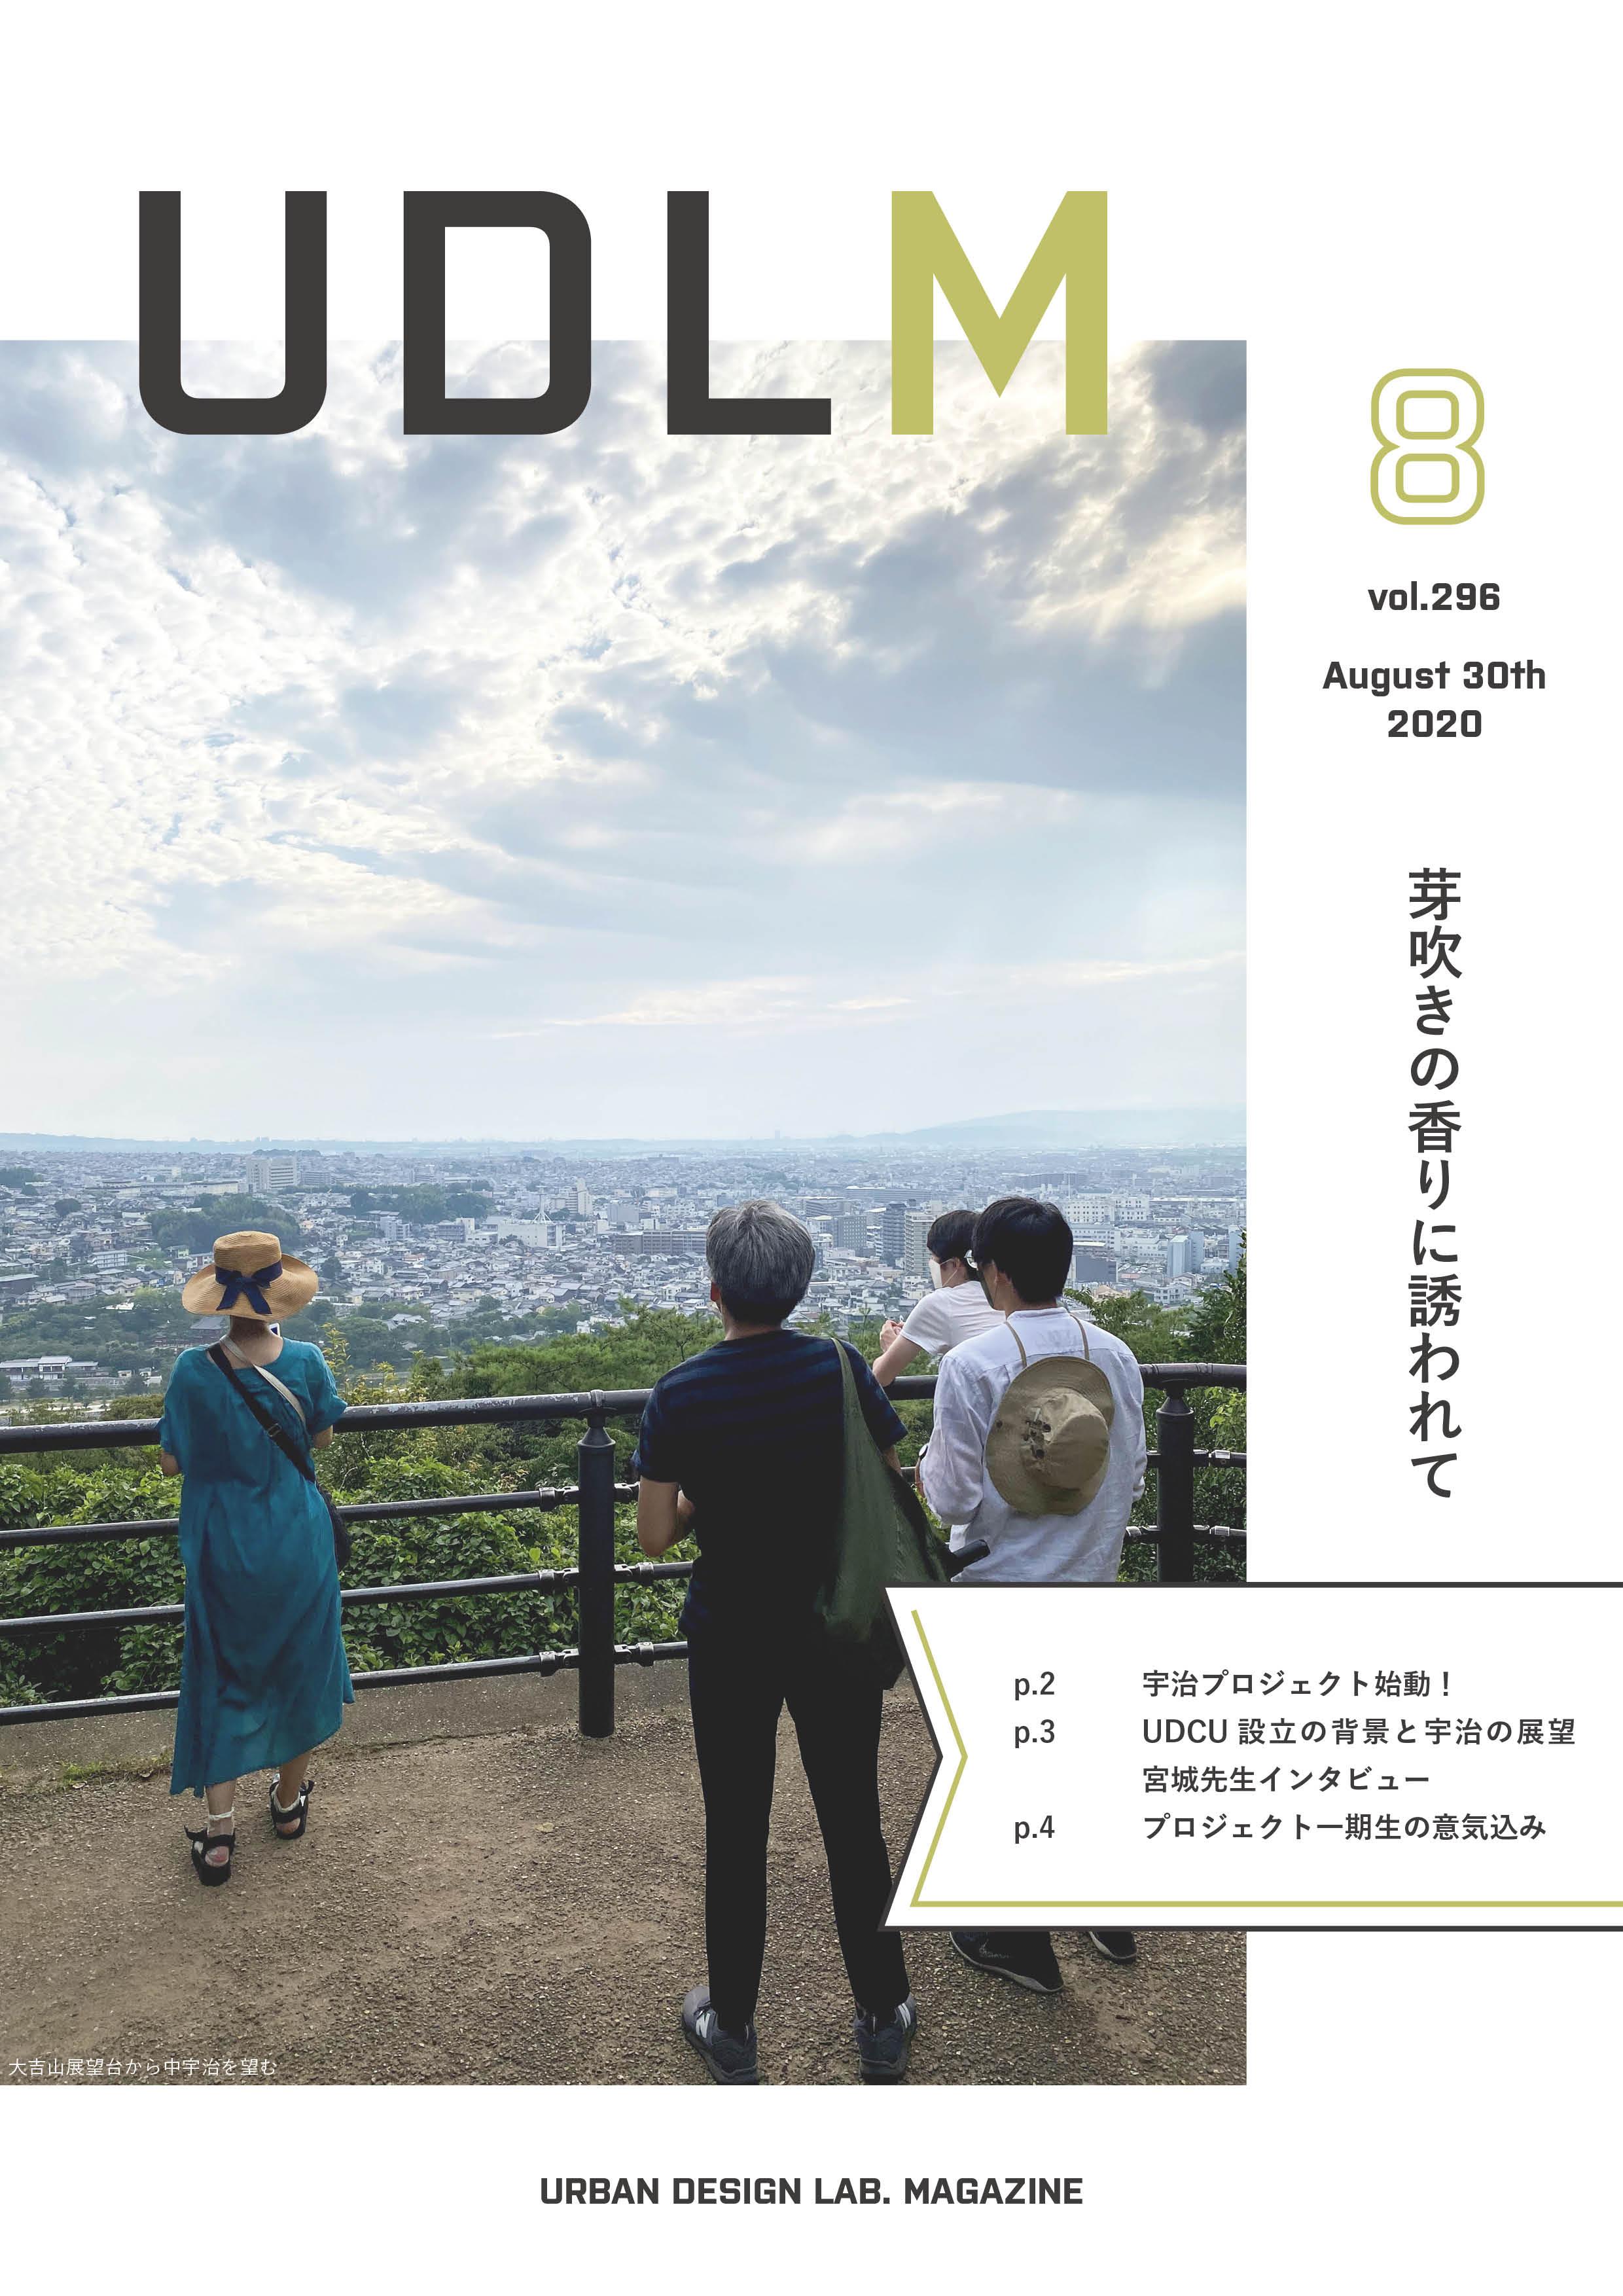 http://ud.t.u-tokyo.ac.jp/blog/_images/vol.296-1.jpg